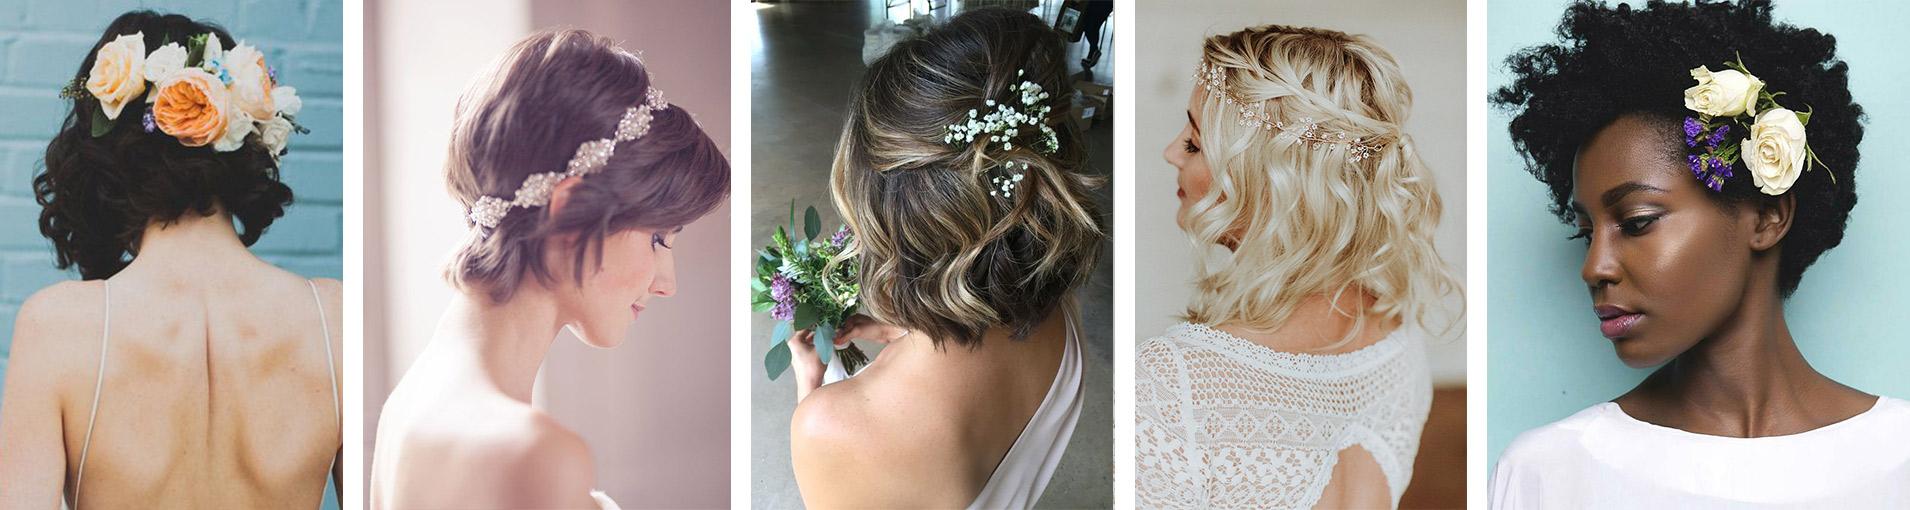 Top 25 Penteados Para Cabelos Curtos Para Casamento